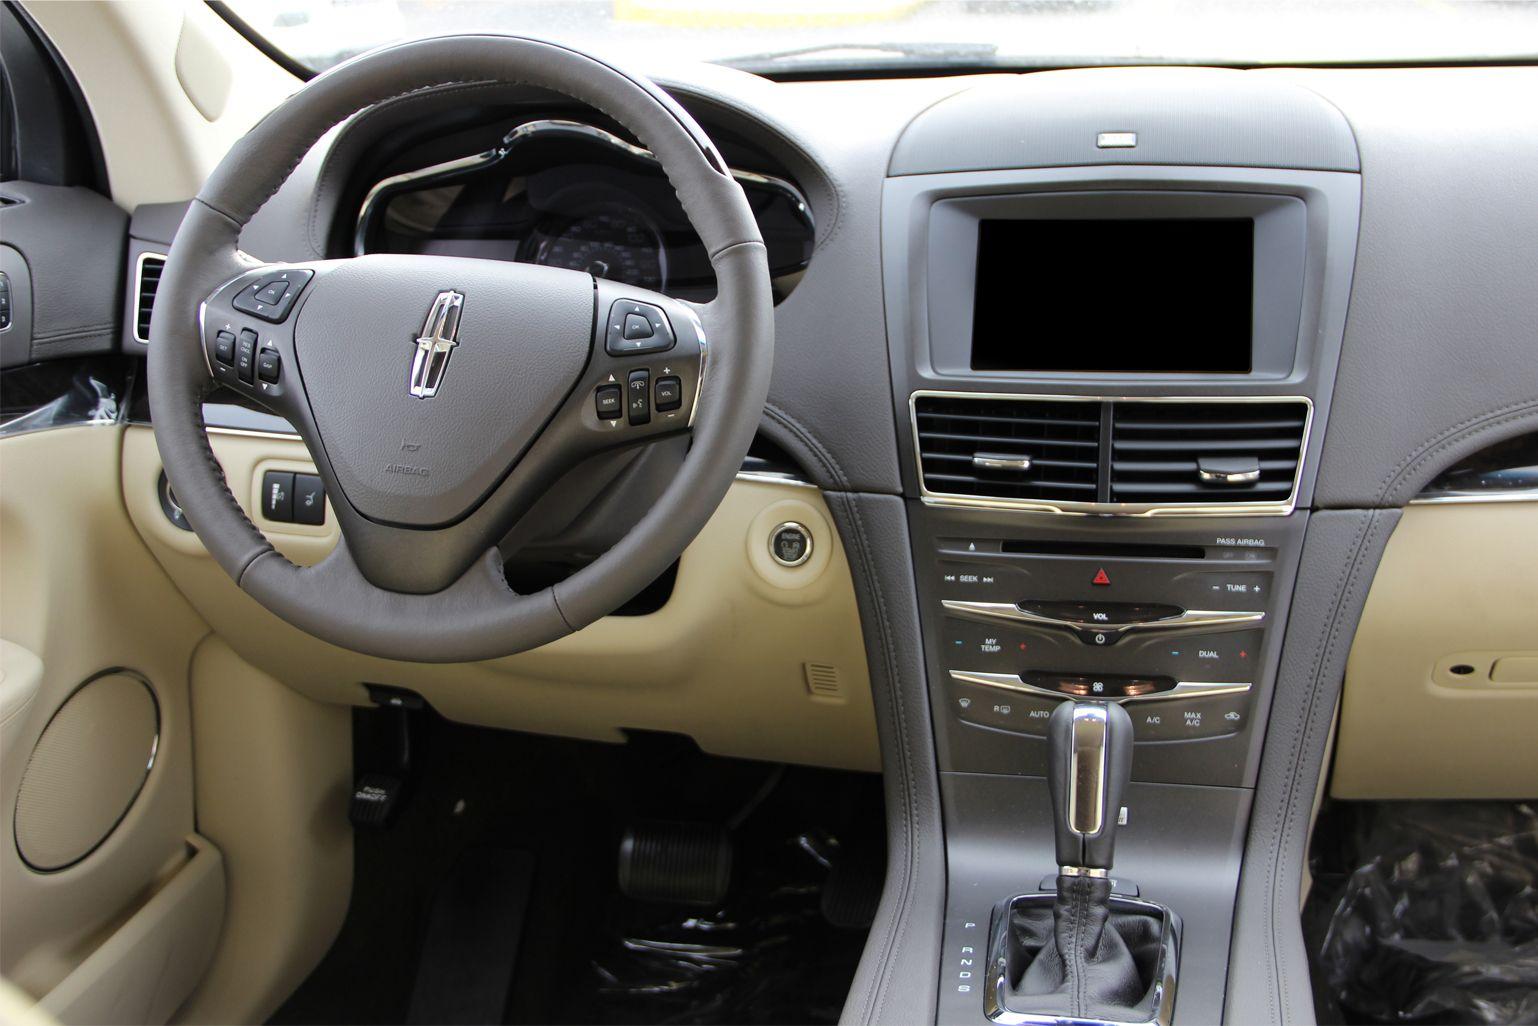 2014 Lincoln MKT Interior